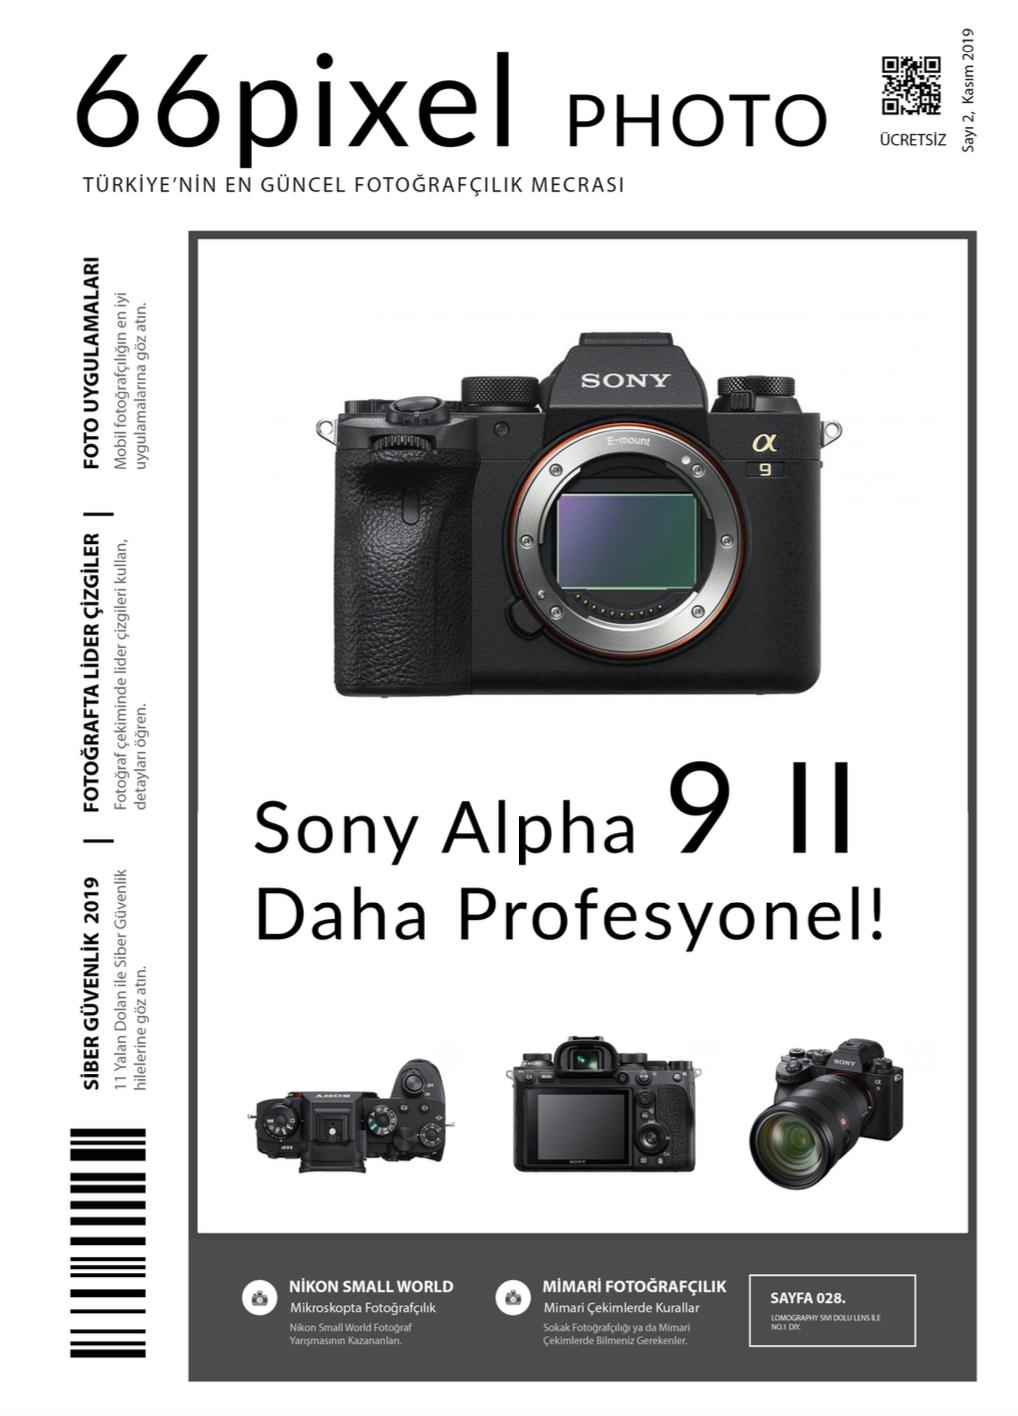 fotografcilik-dergisi